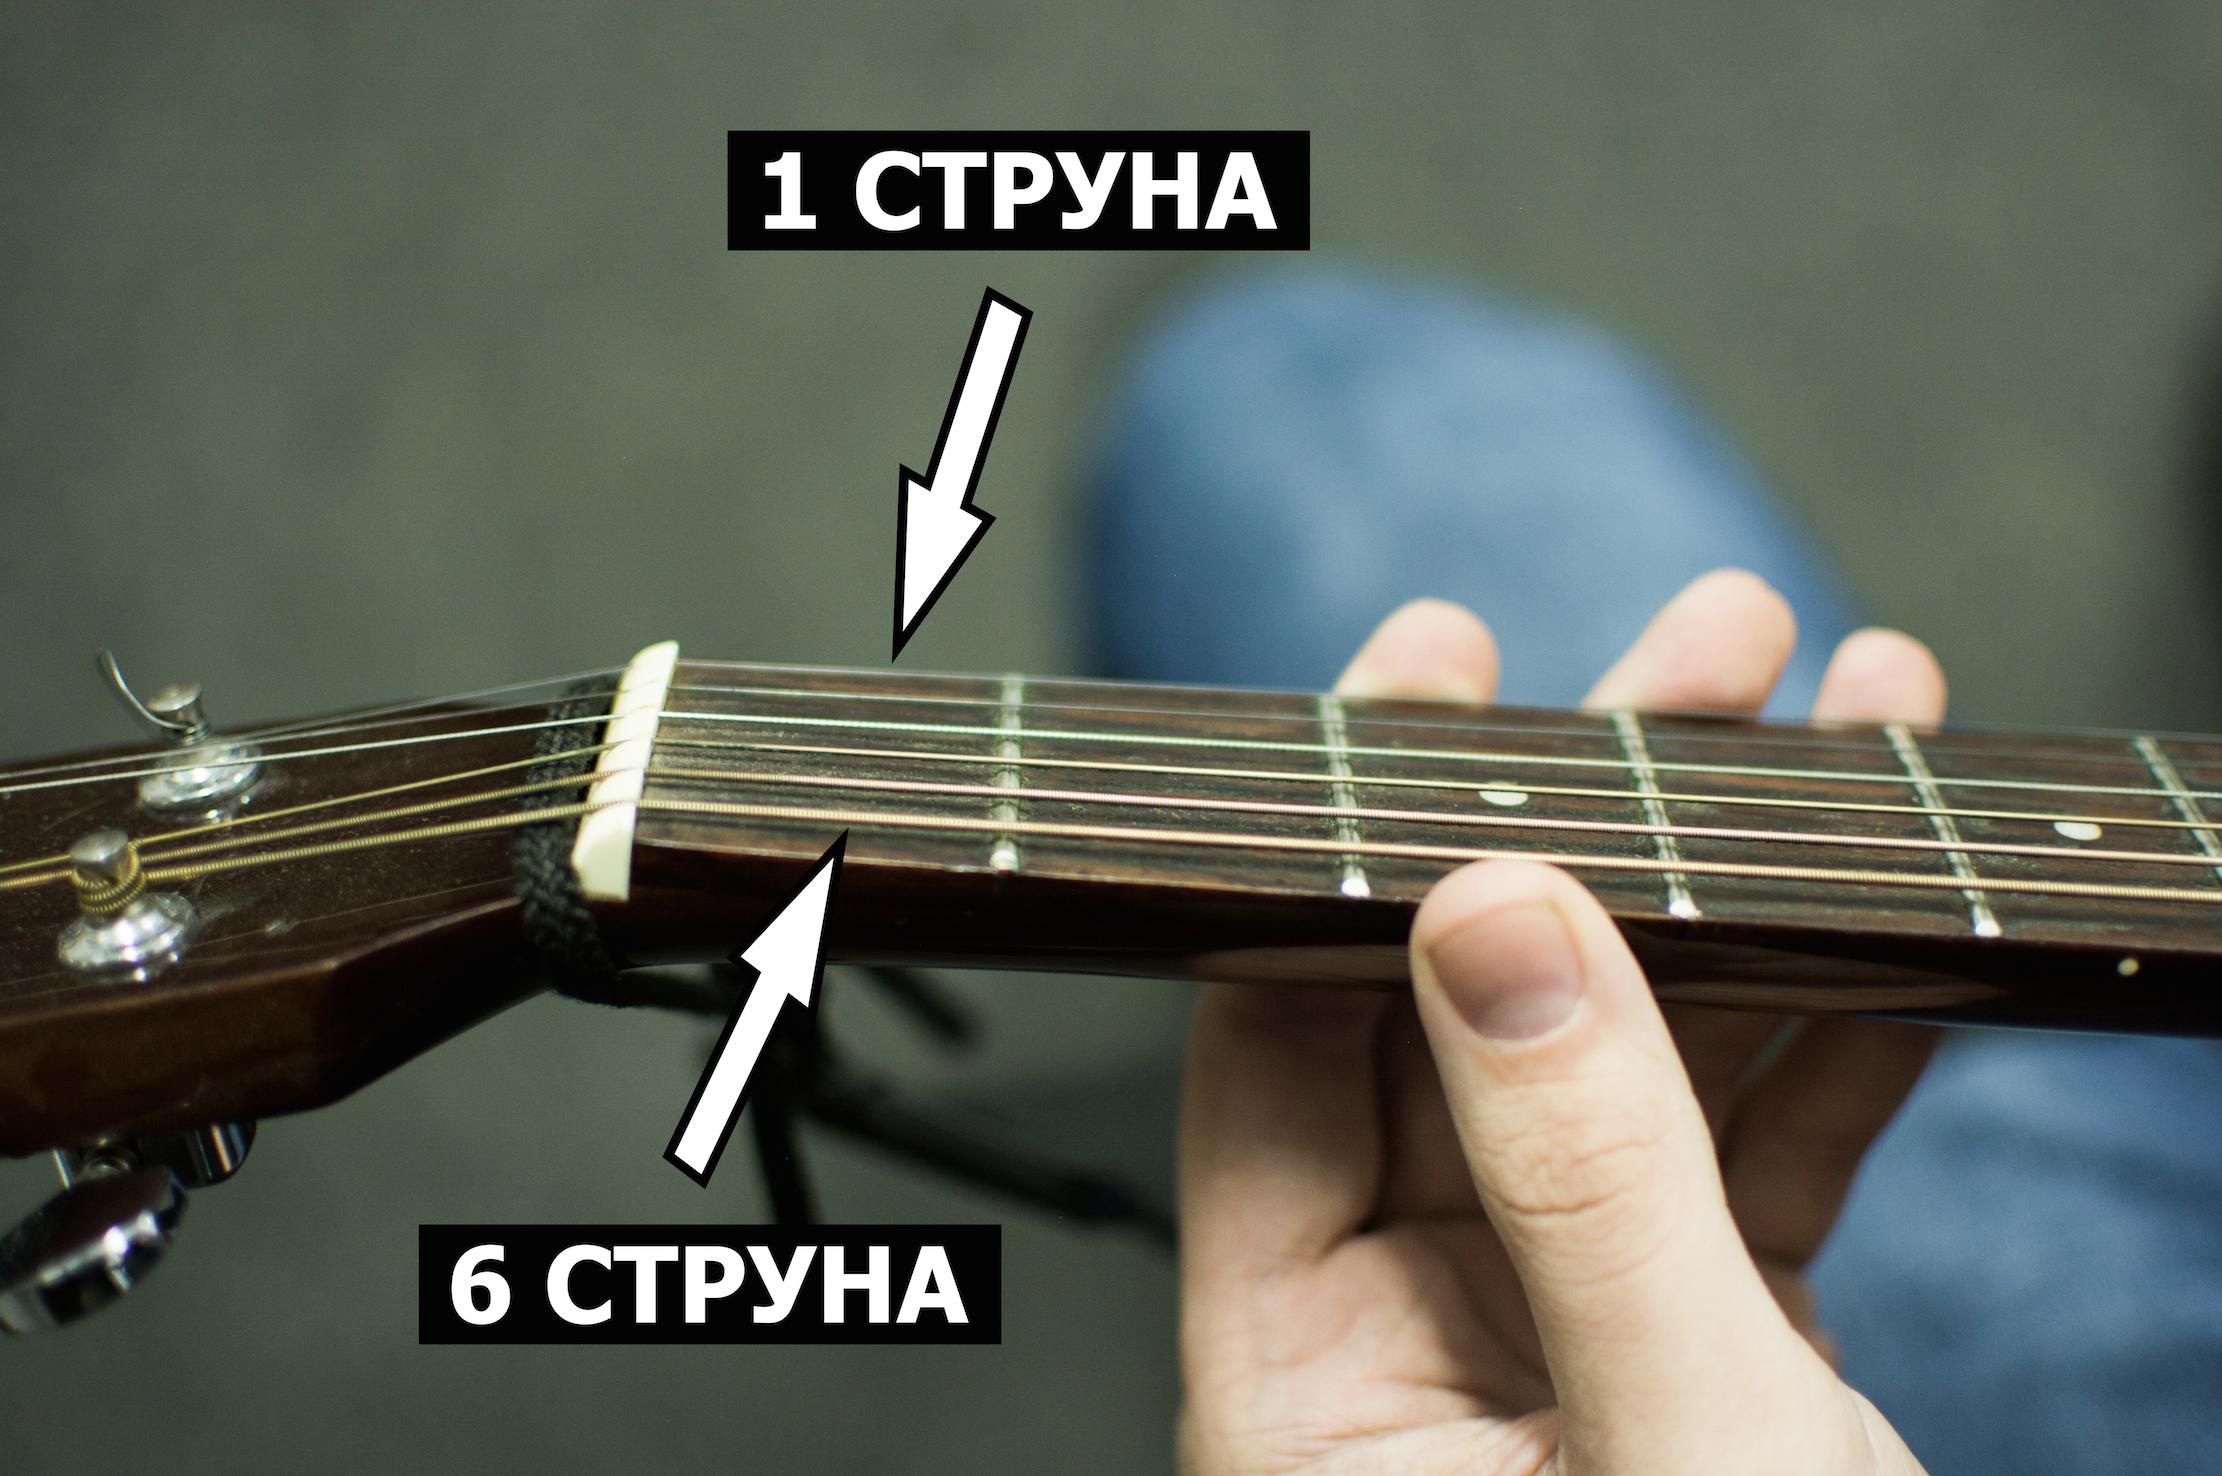 Номера струн на гитаре вид сверху